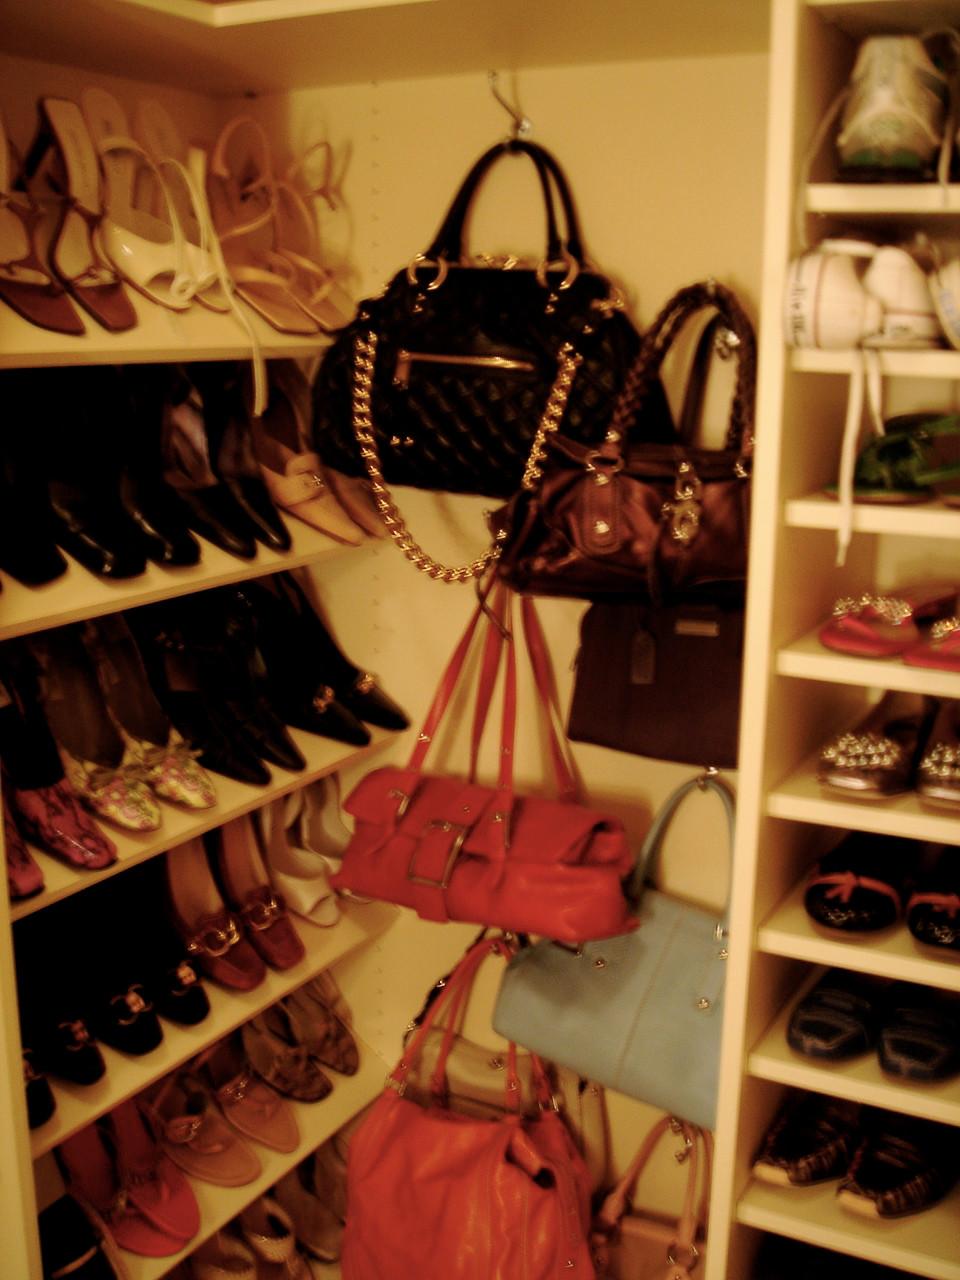 Same Stuff Different Way - Reorganized Dressing Room